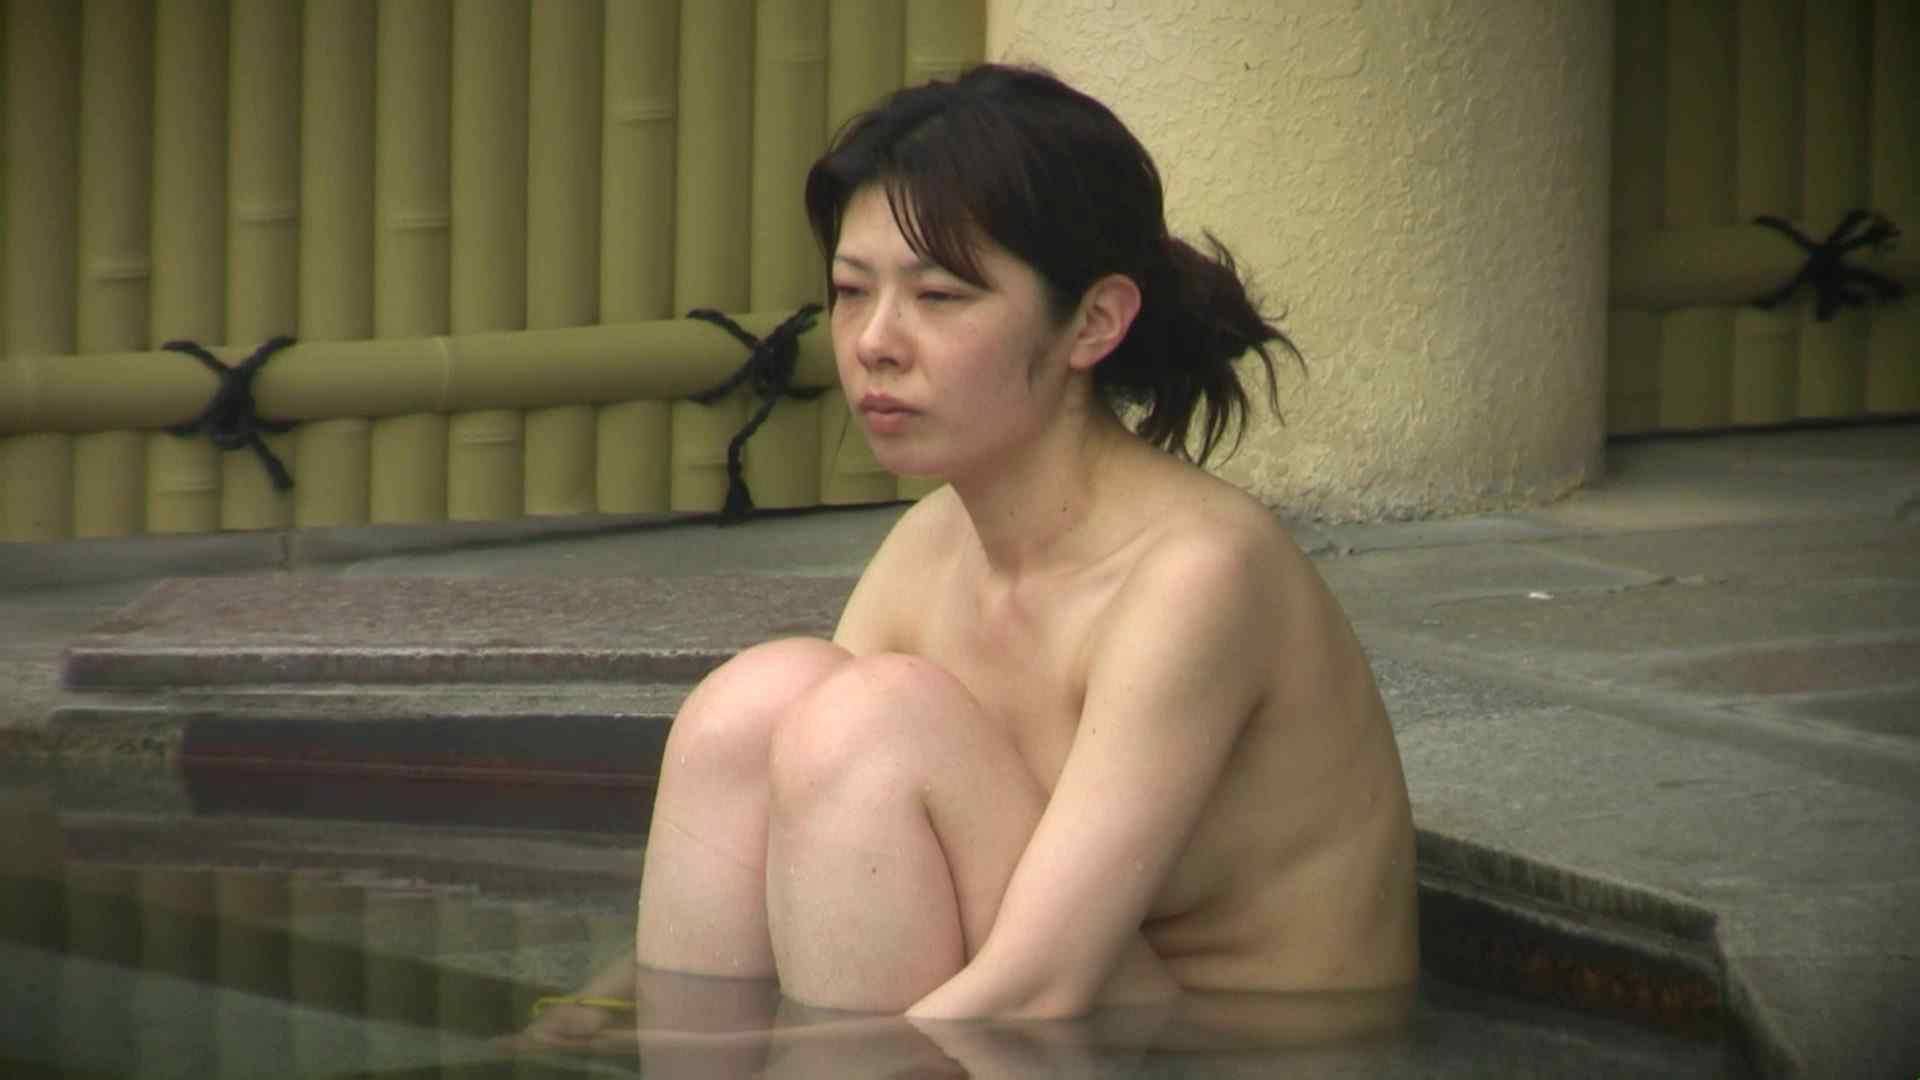 Aquaな露天風呂Vol.676 盗撮シリーズ | 露天風呂編  83PIX 55